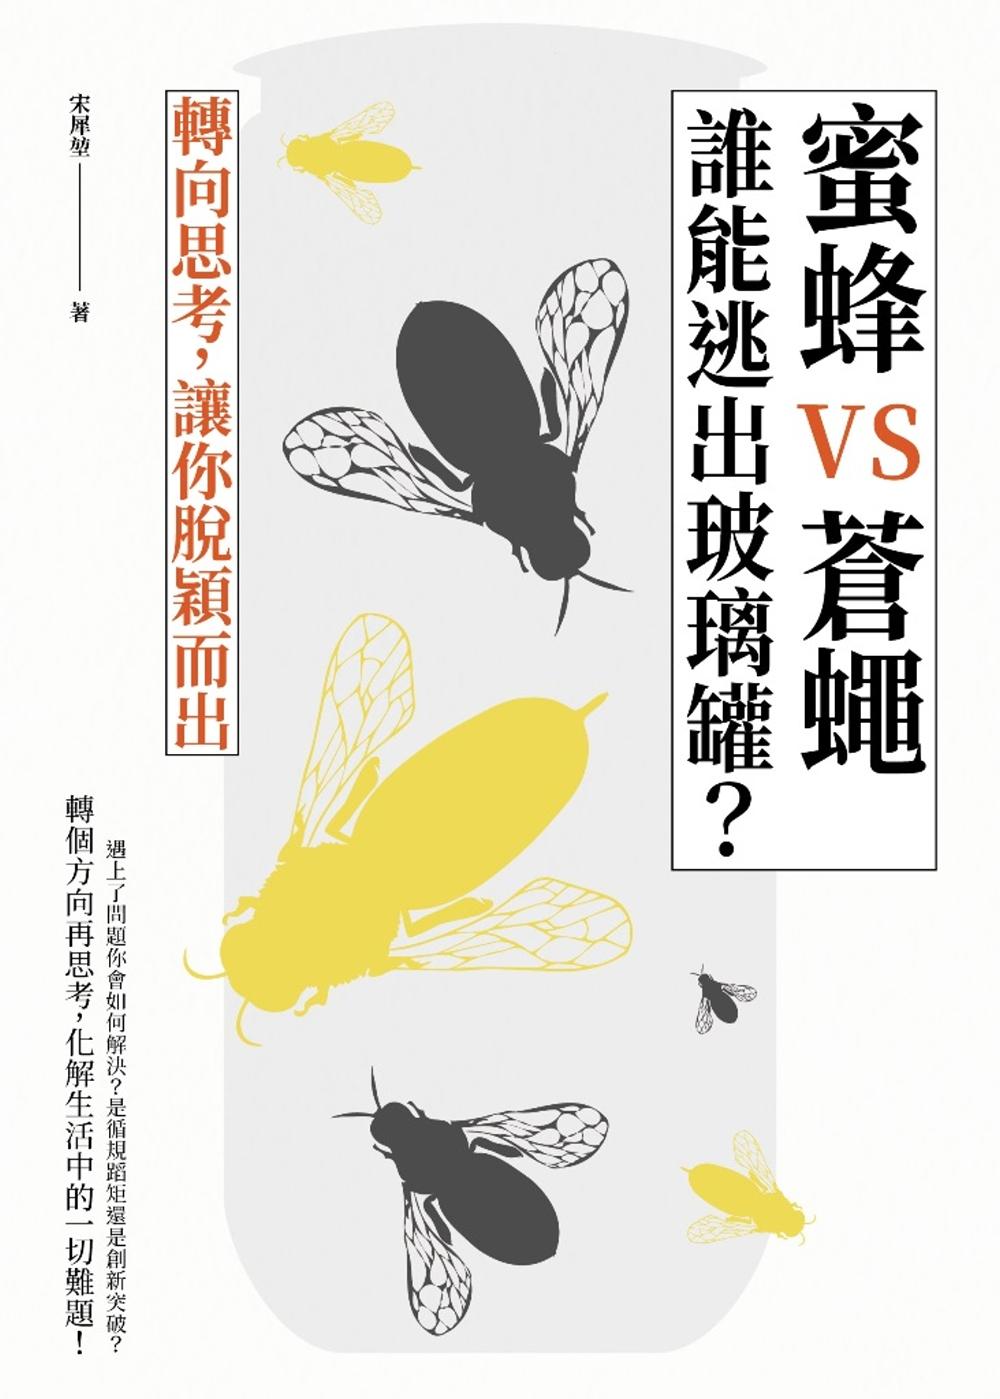 蜜蜂V.S.蒼蠅誰能逃出玻璃罐...